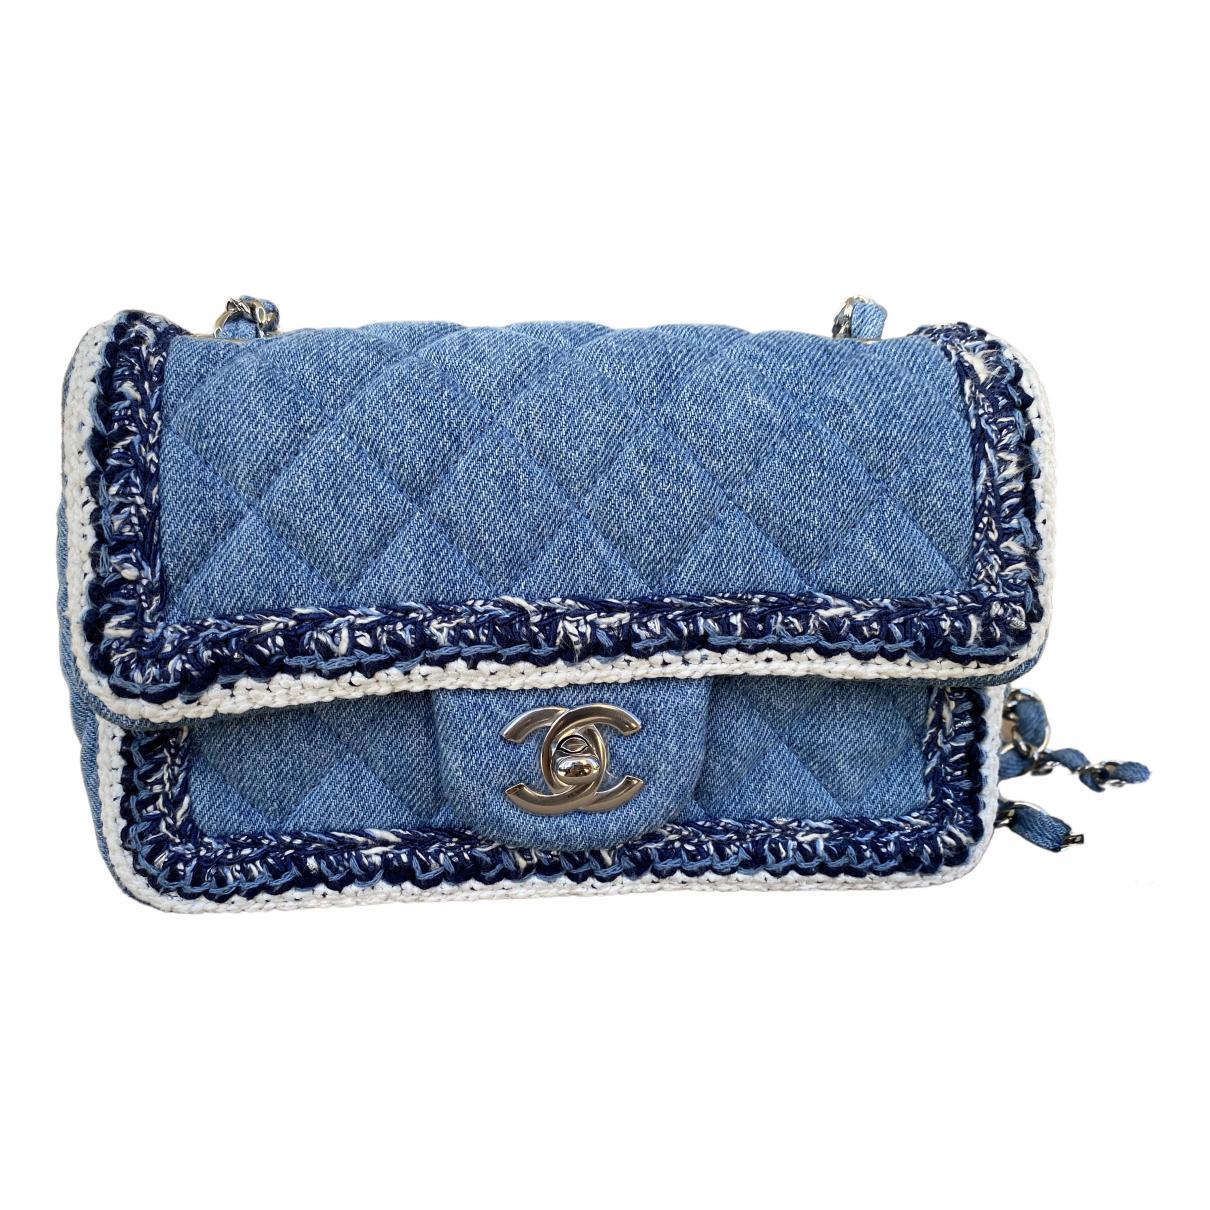 Chanel Timeless/Classique Blue Denim - Jeans handbag for Women \N